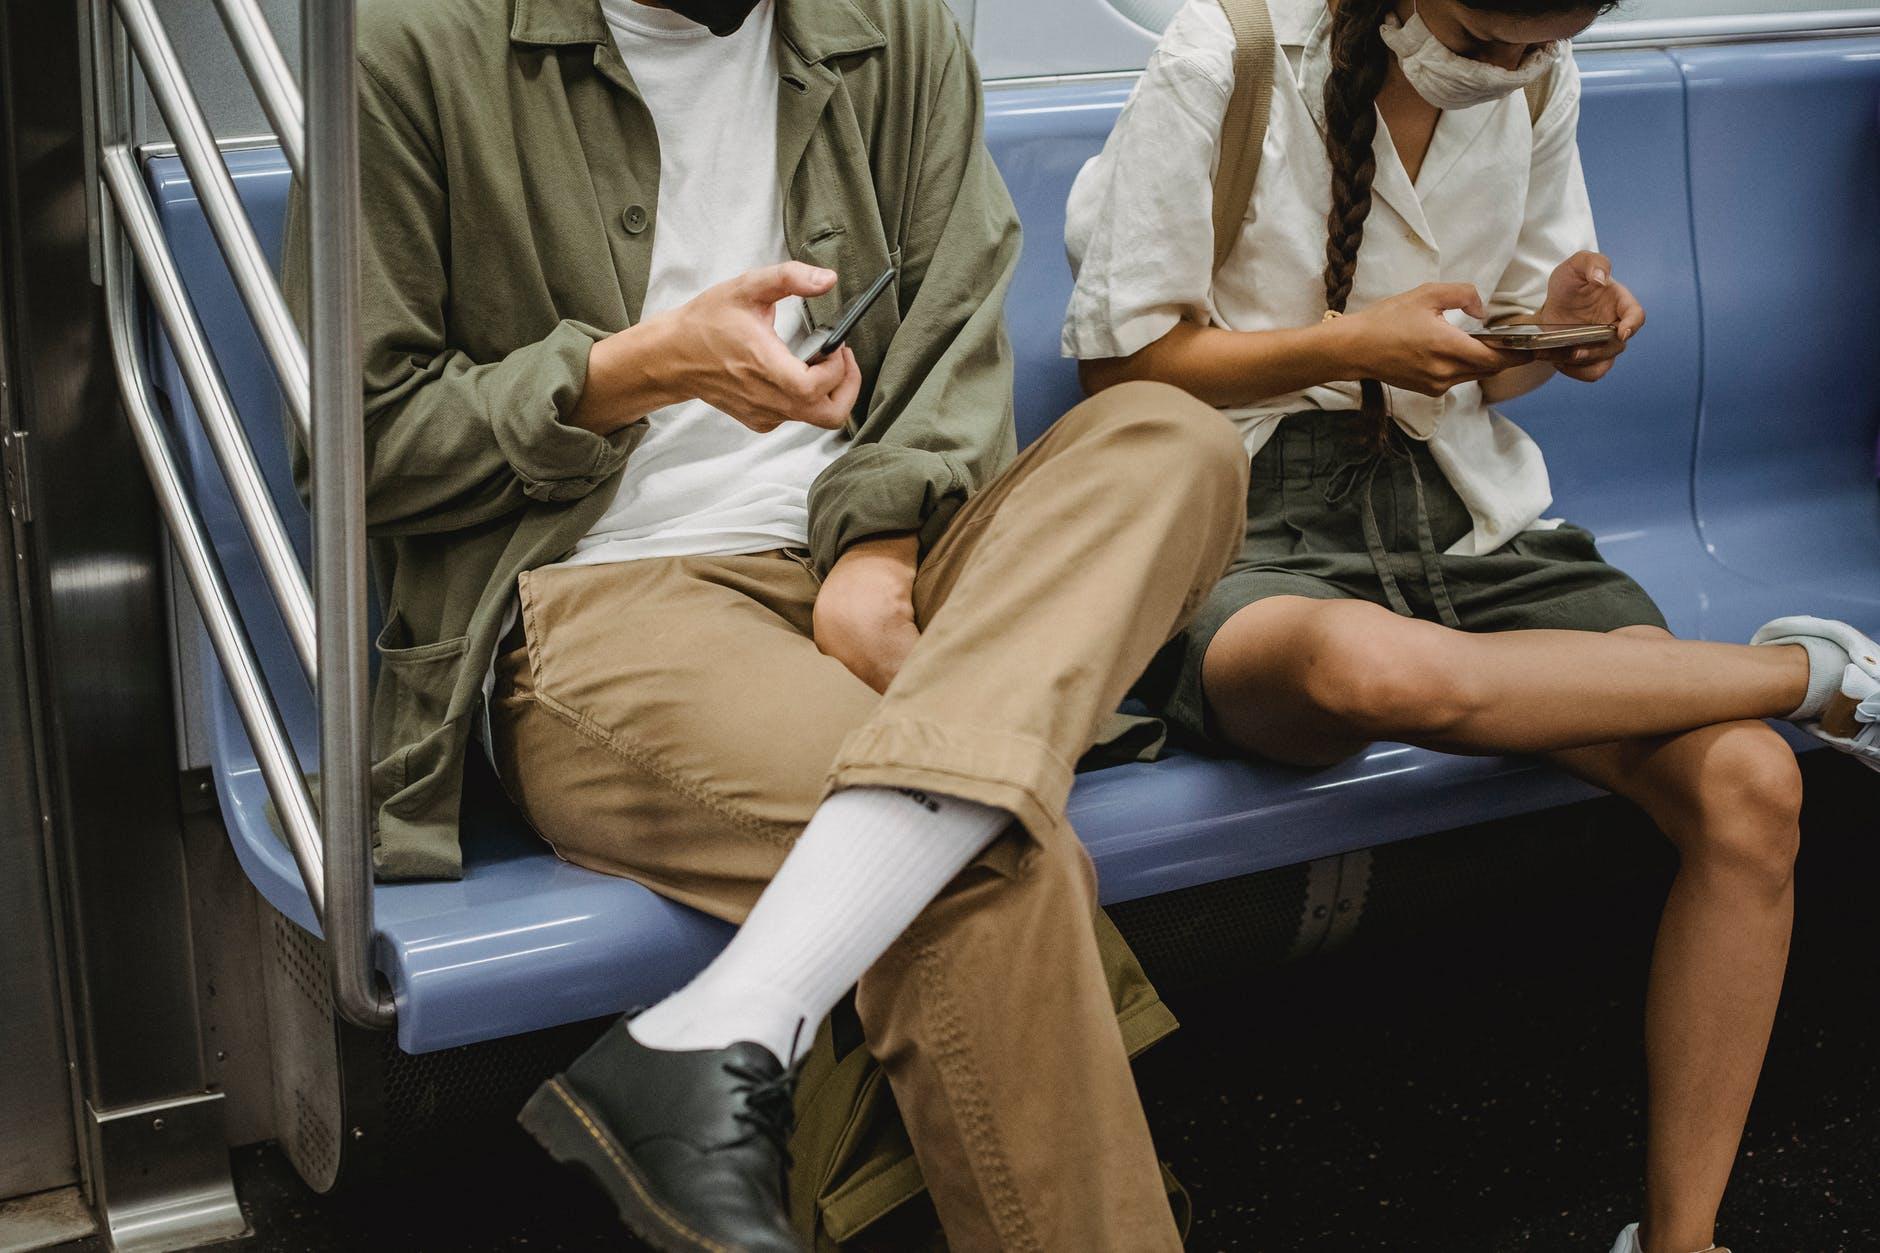 crop couple browsing smartphones in subway carriage